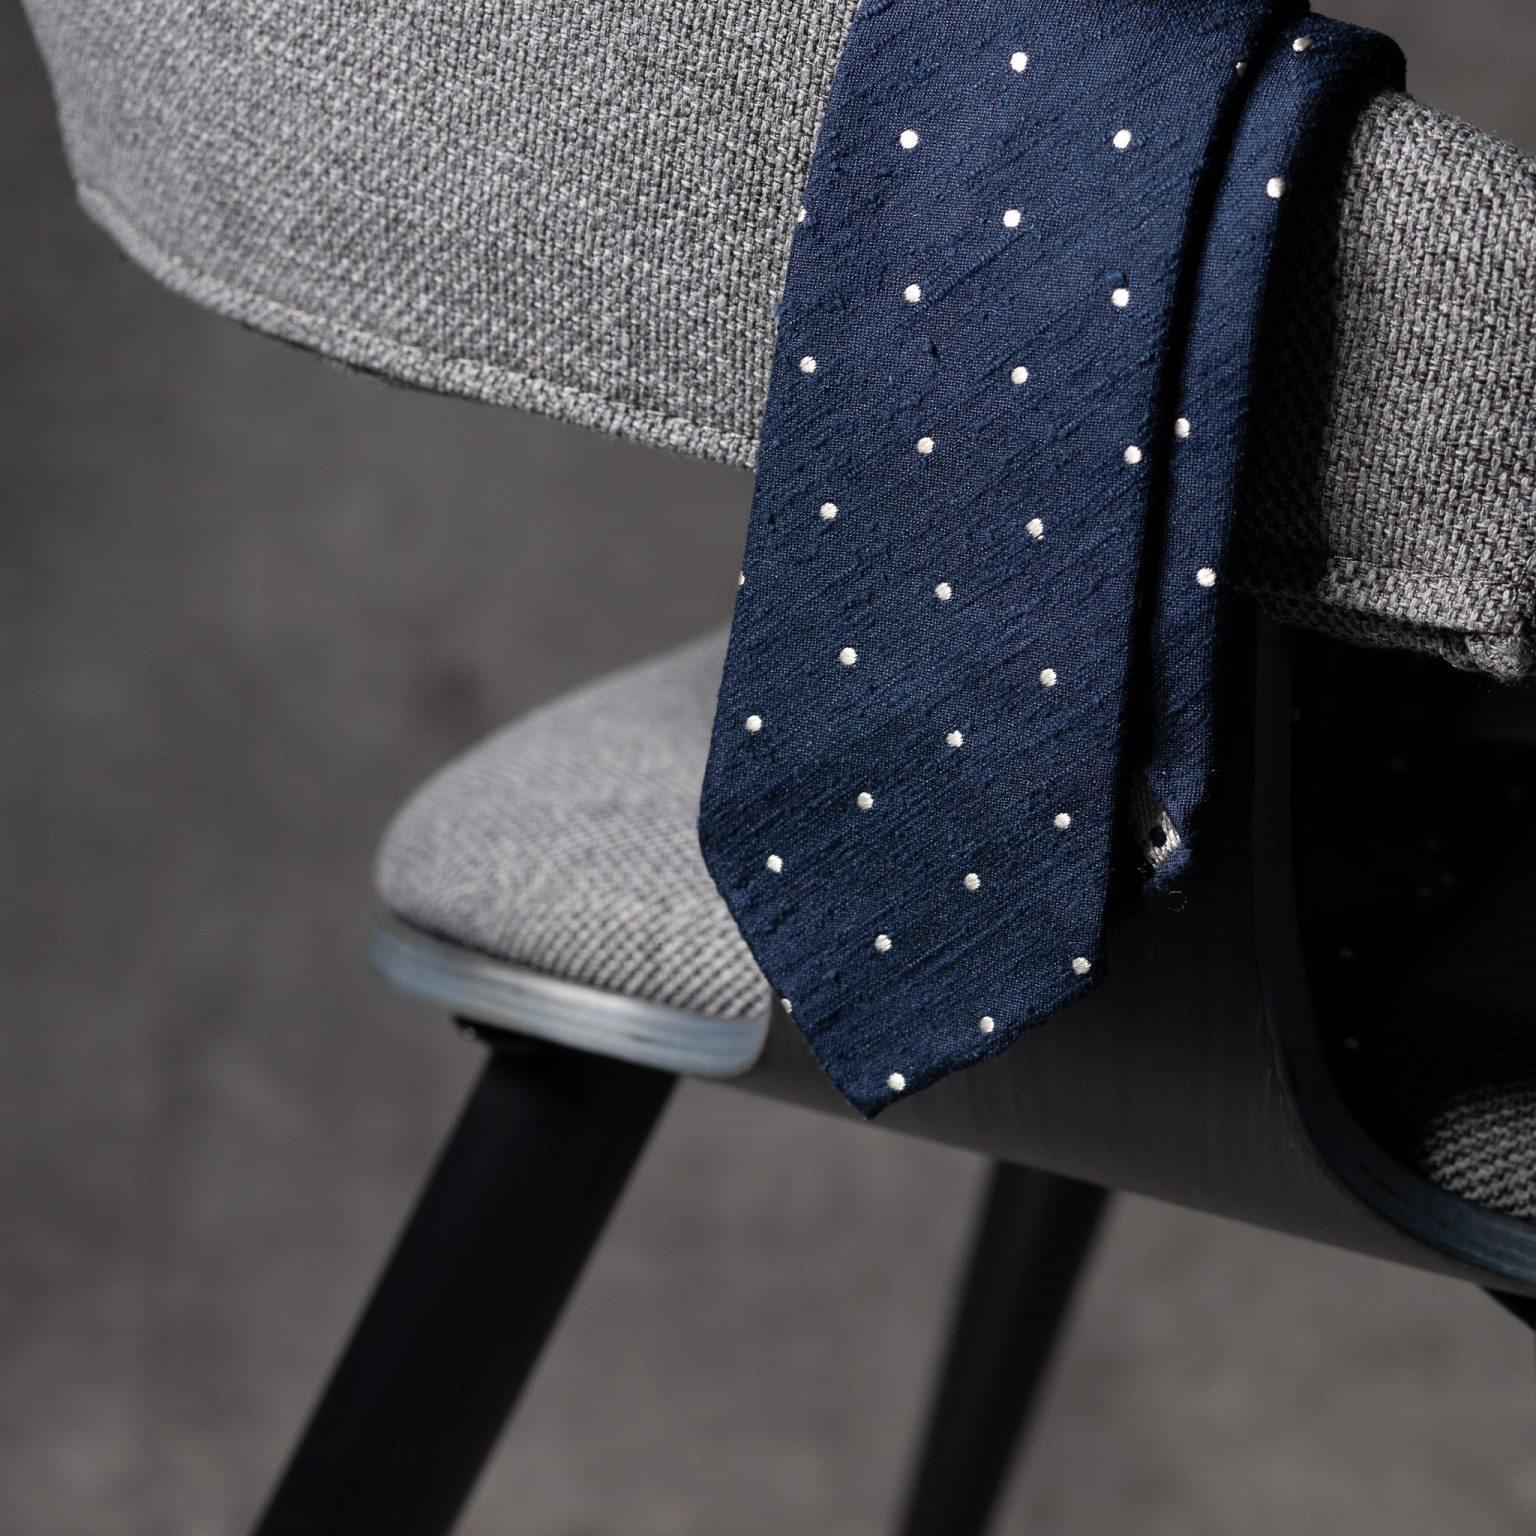 SHANTUNG-0527-Tie-Initials-Corbata-Iniciales-The-Seelk-2